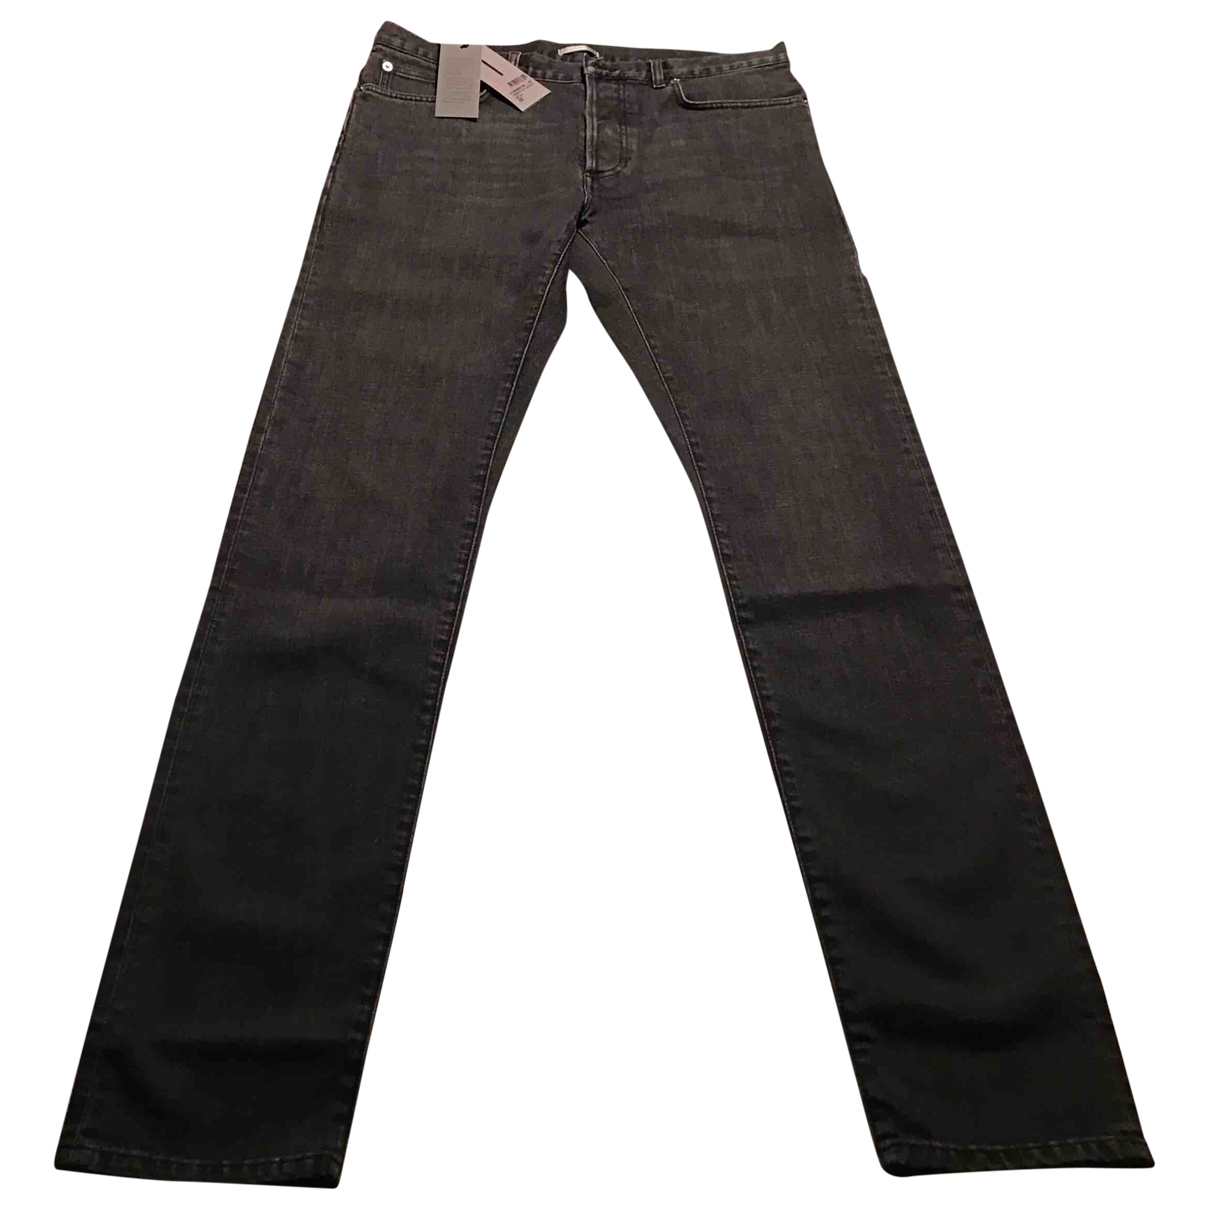 Dior Homme \N Black Cotton - elasthane Jeans for Men 32 US